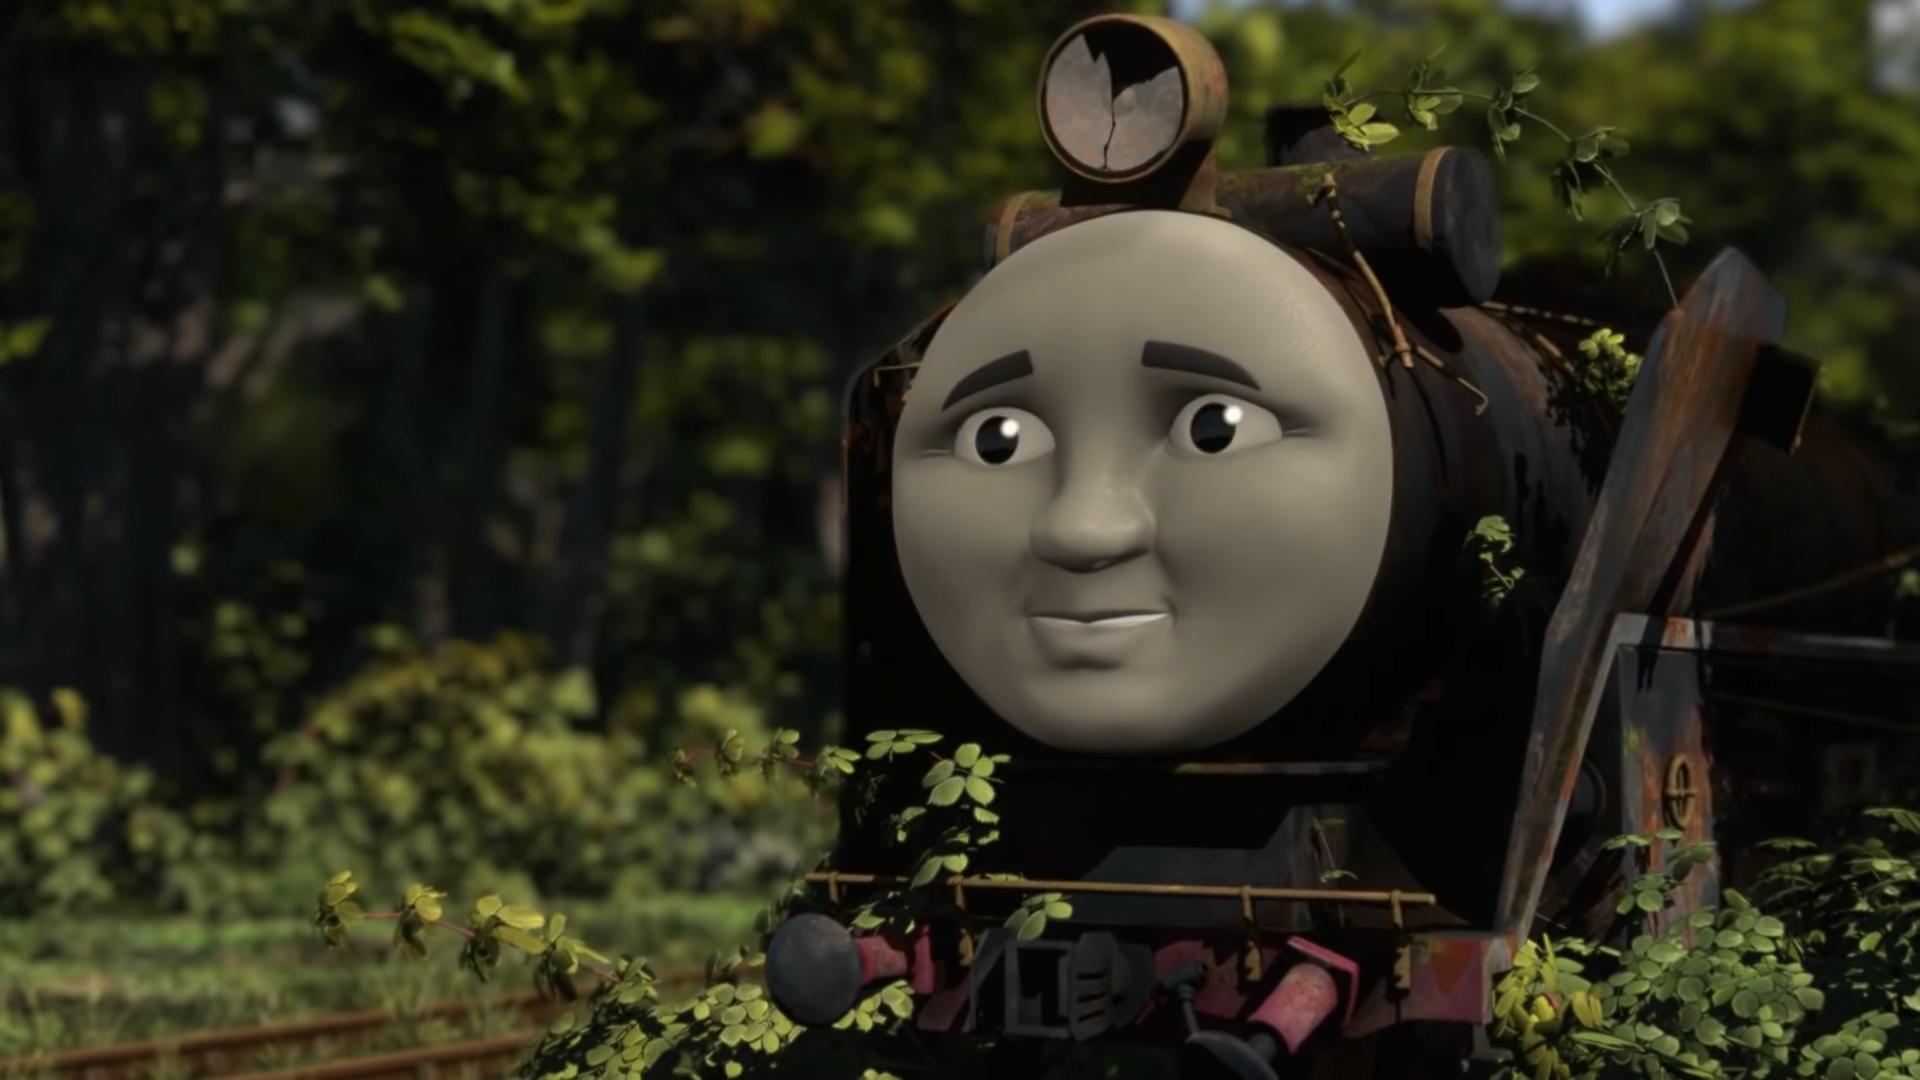 Hiro's Old Railway